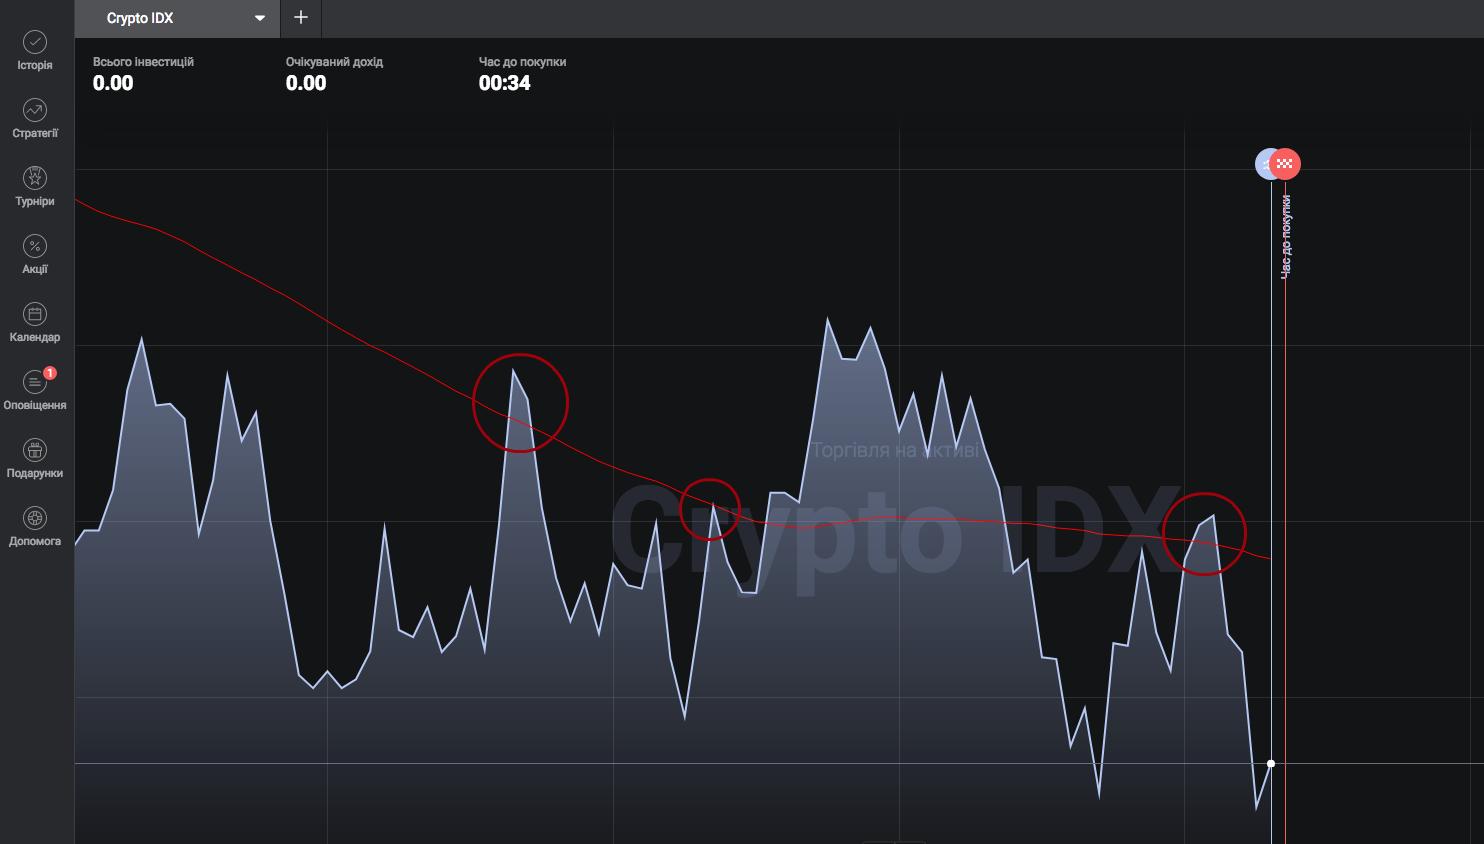 Стратегія «Укол» - сигнал для продажу